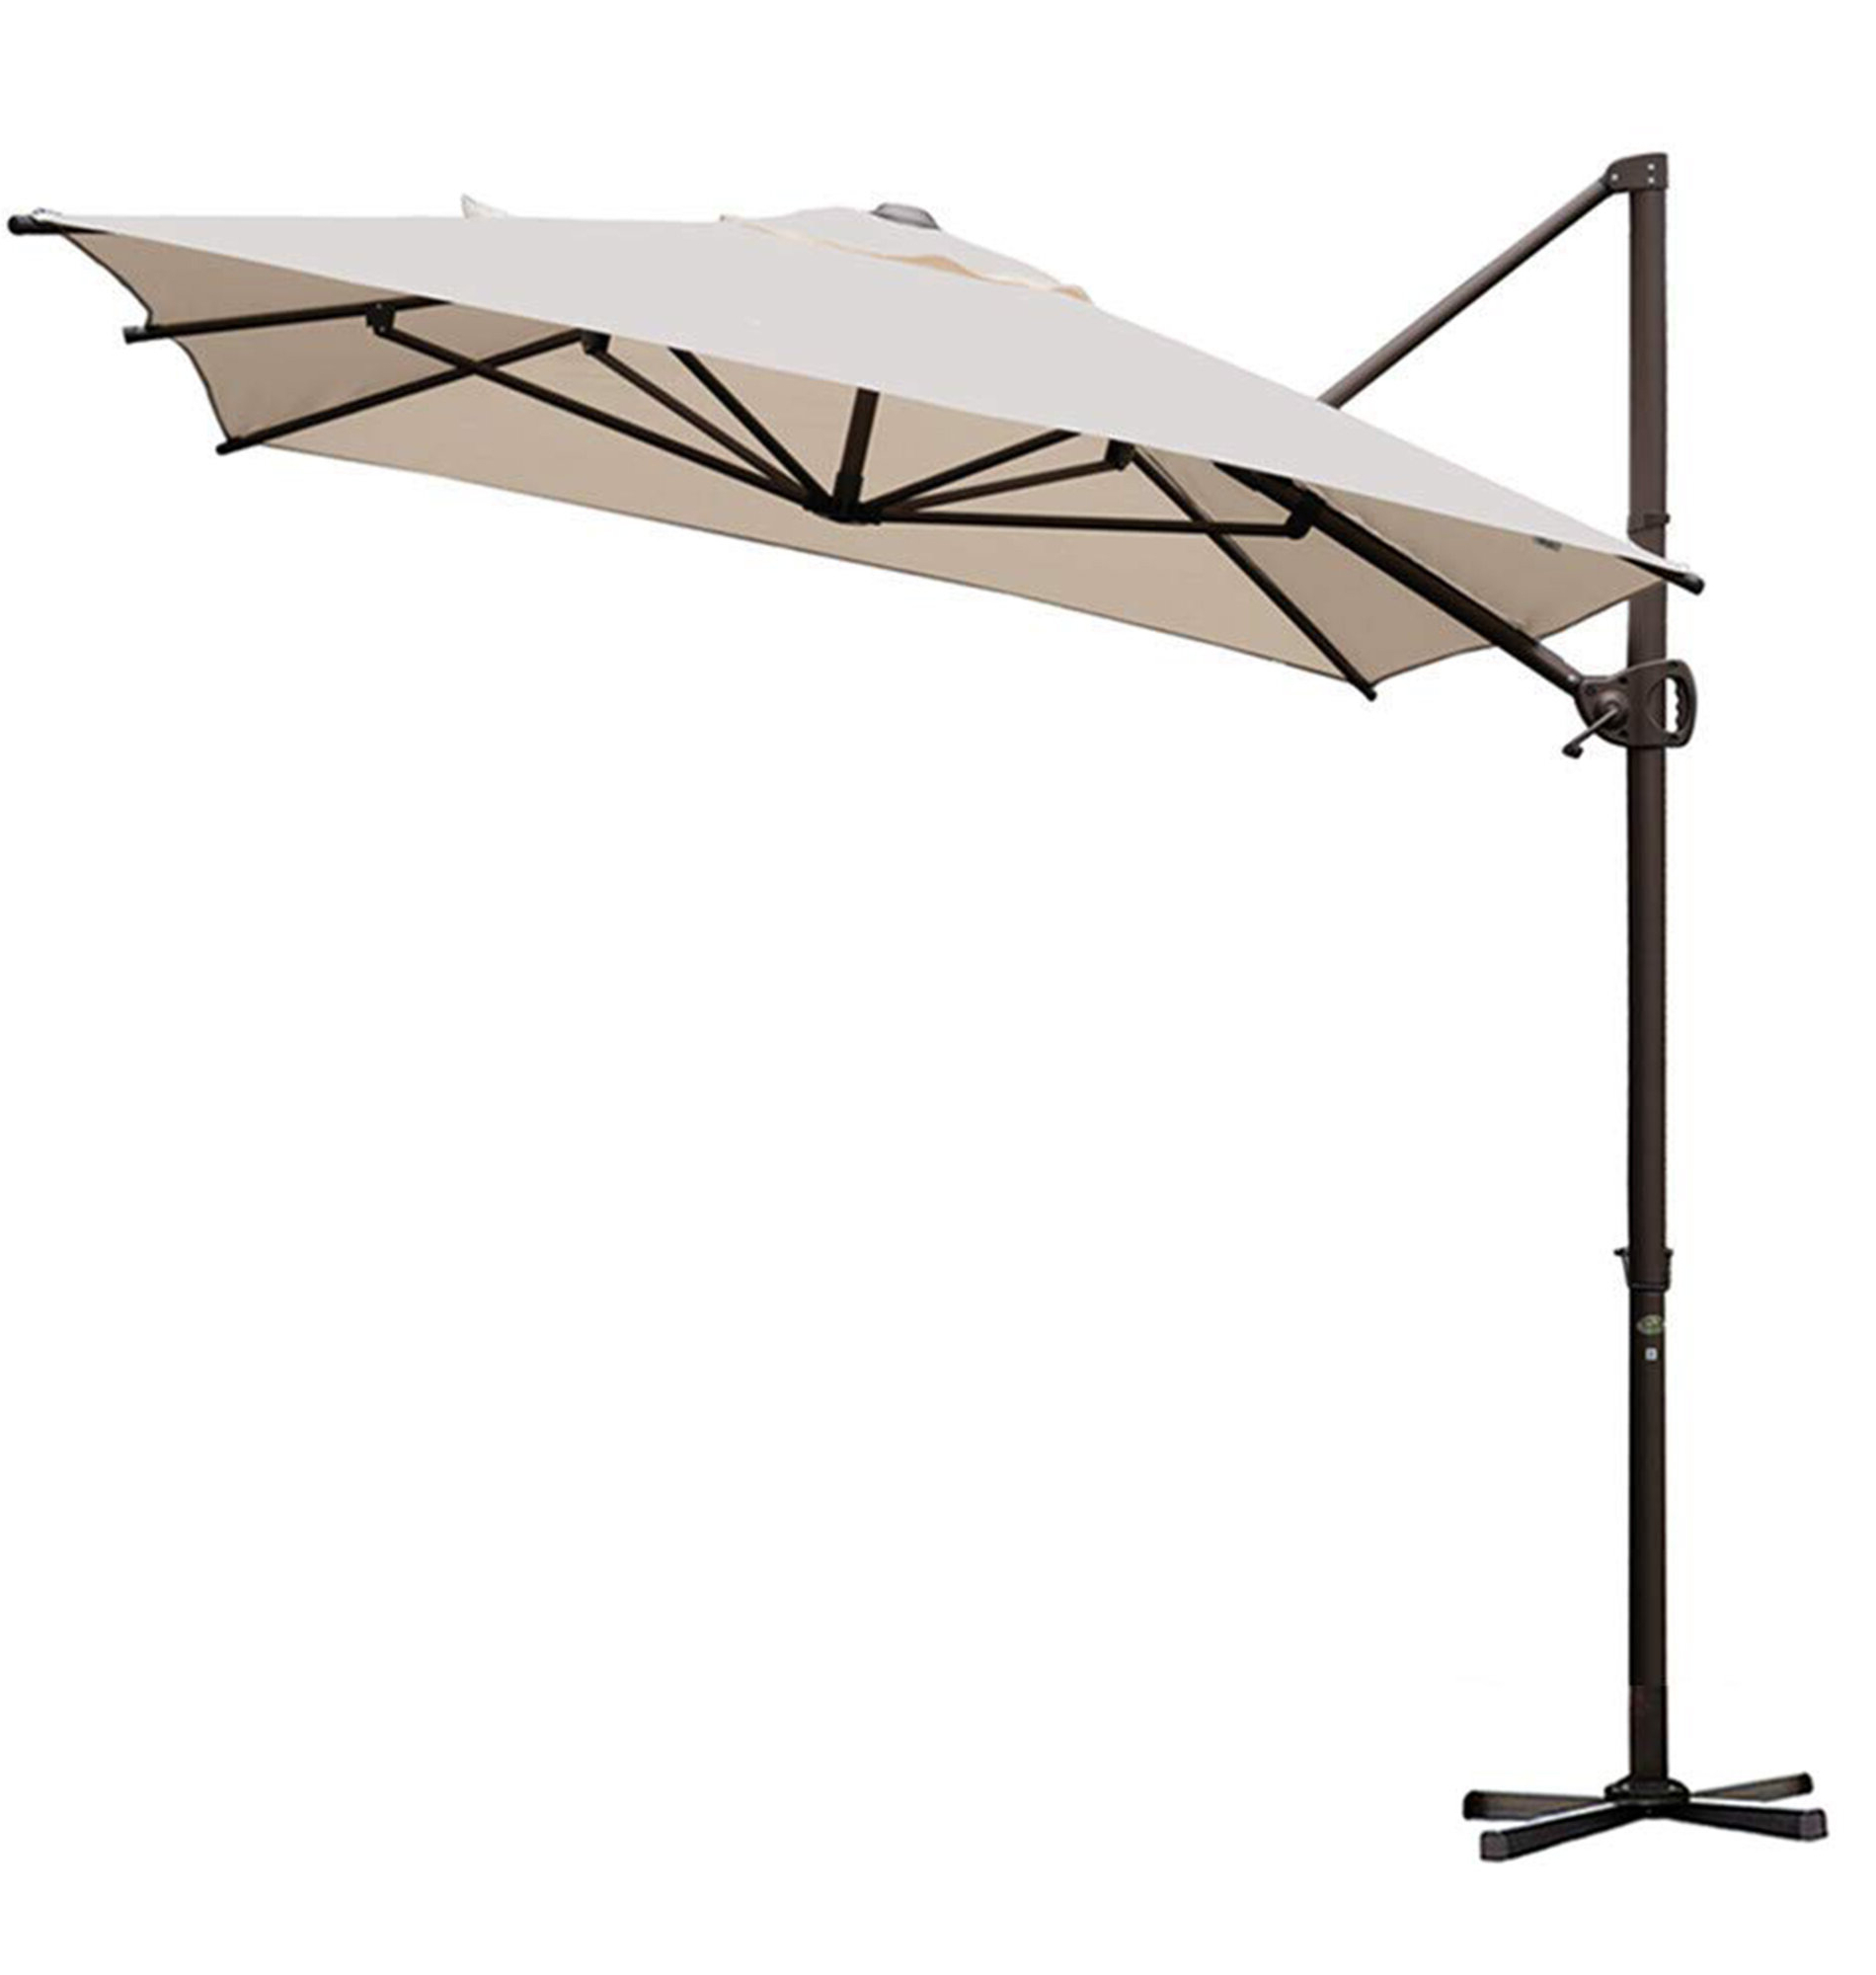 Fordwich Rectangular Cantilever Umbrellas Throughout Most Popular Walter 9' X 7' Rectangular Cantilever Umbrella (View 3 of 20)